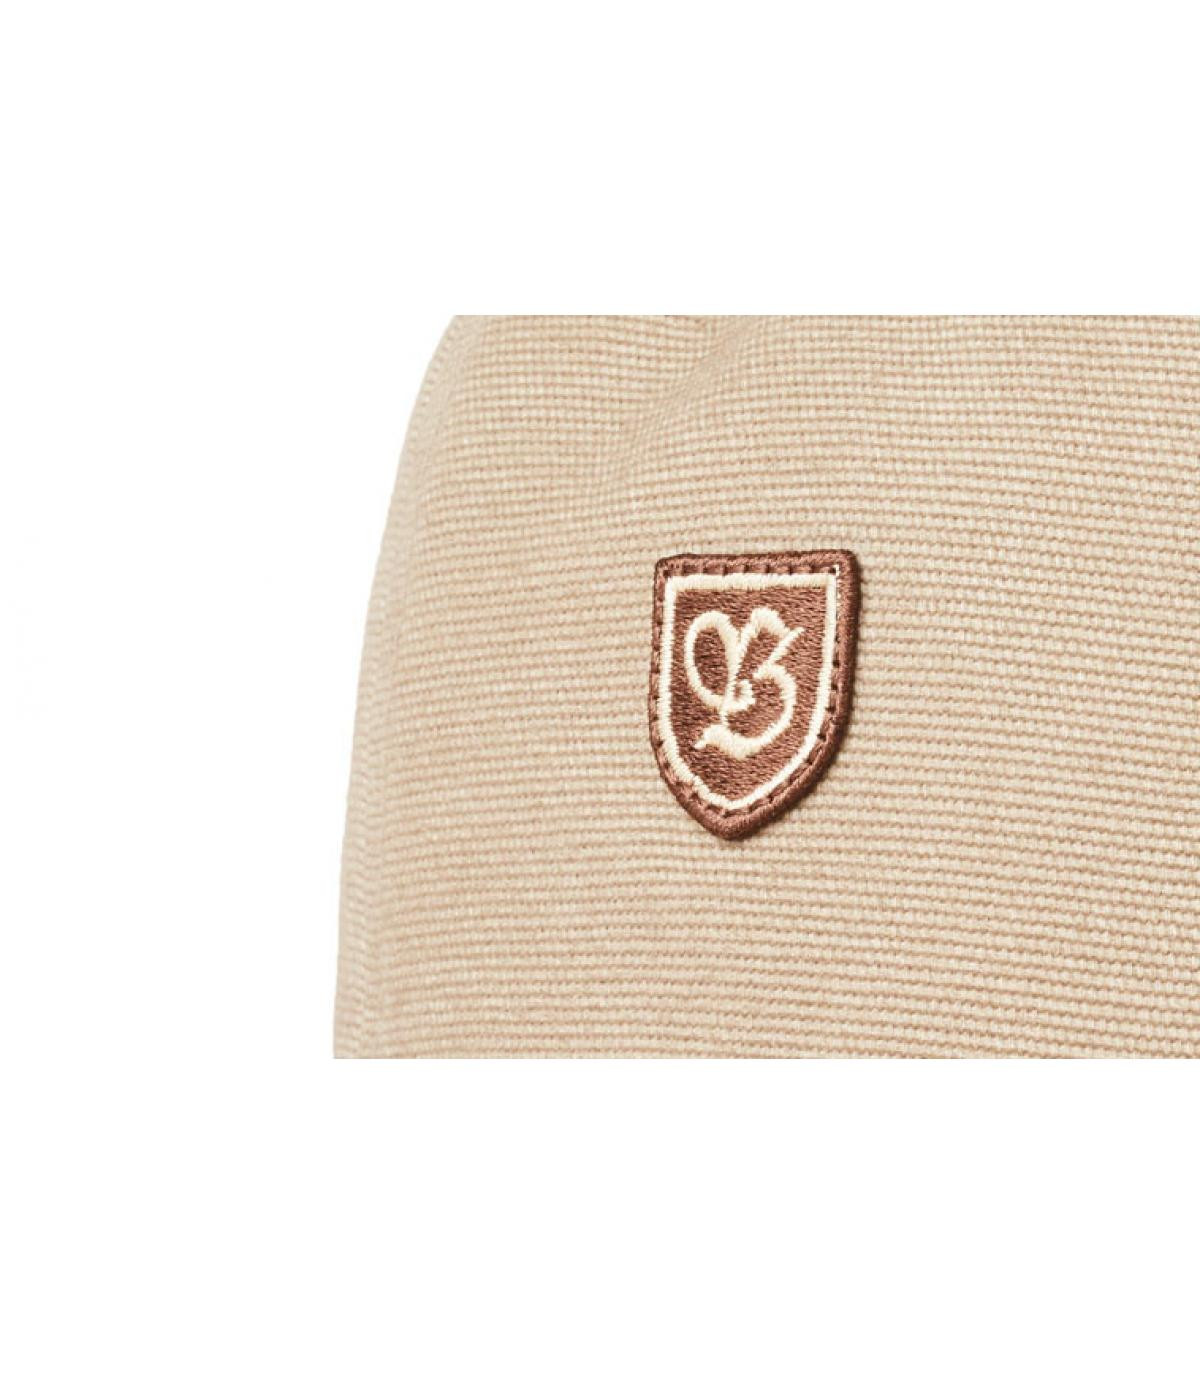 Details B-SHIELD III parchment - Abbildung 3